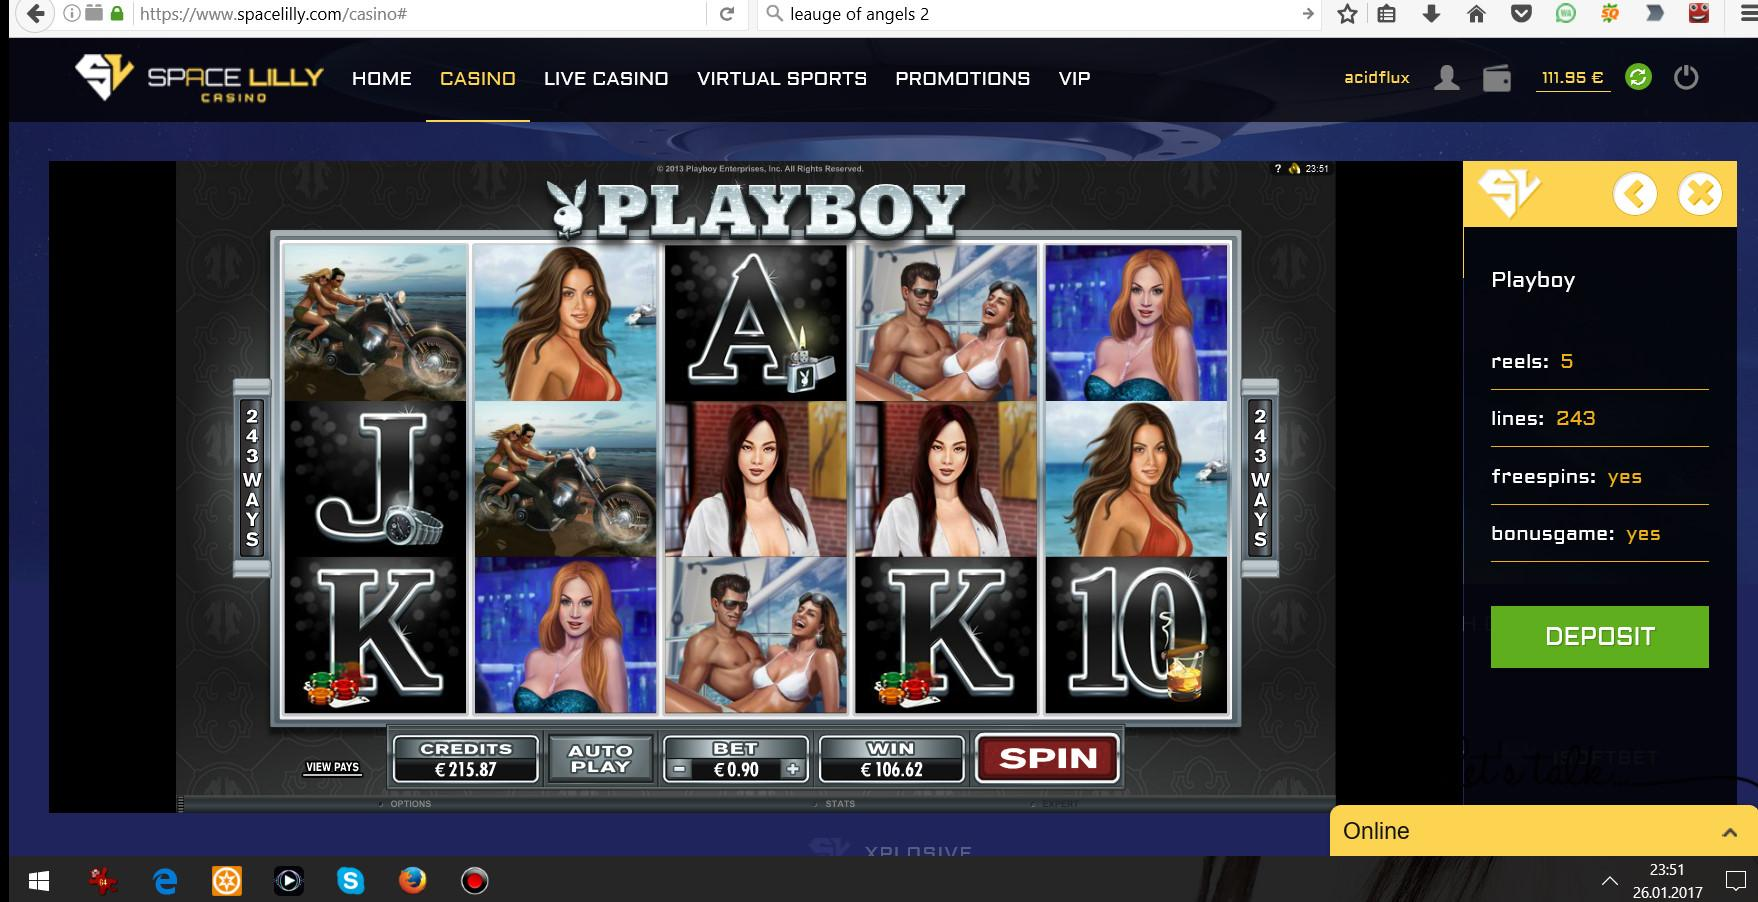 26.01.2017 - 23:51 (GMT +1) - Playboy Online Slot